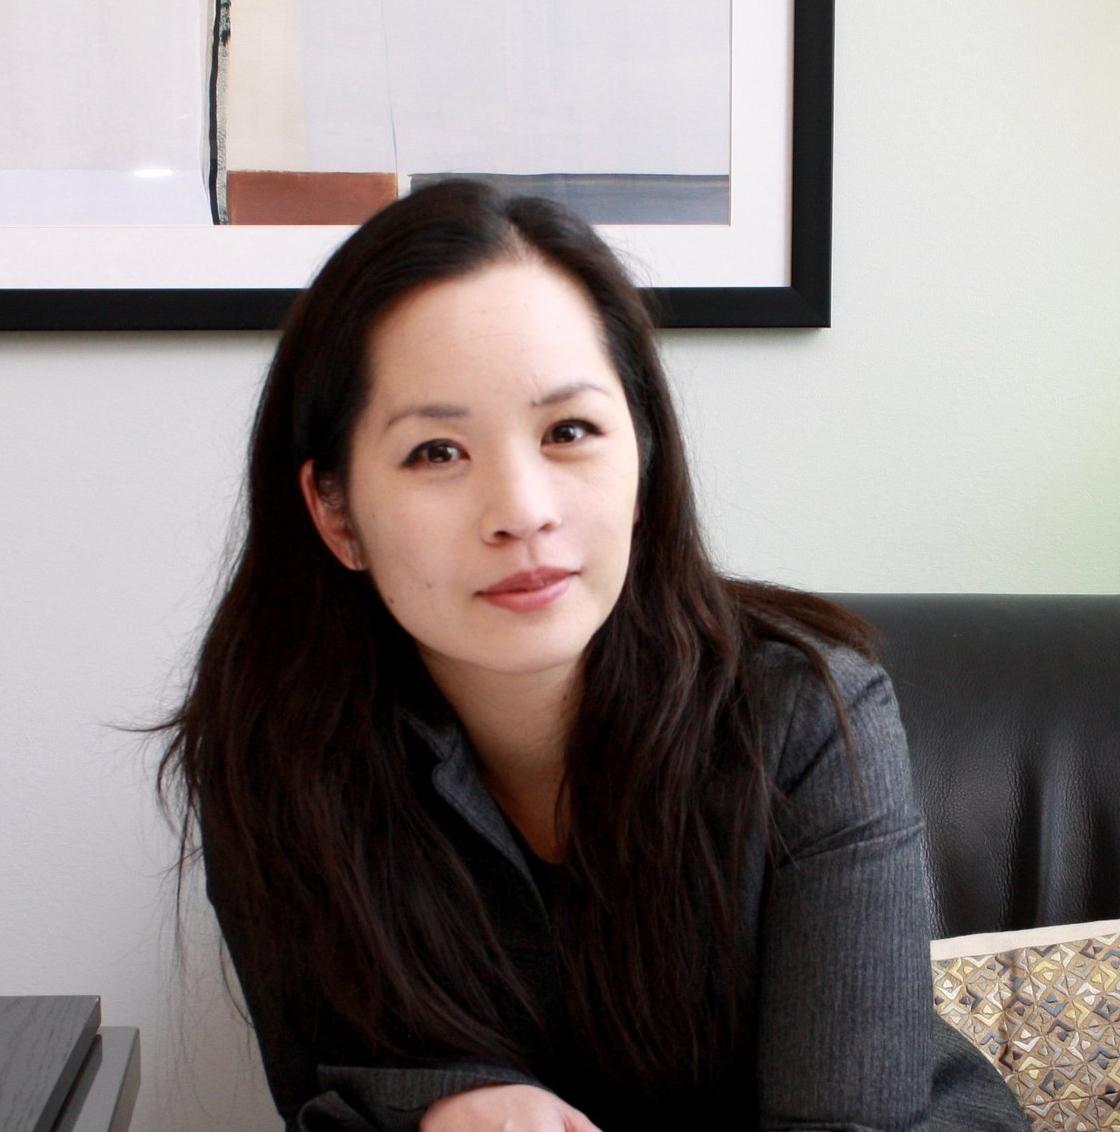 Janie Hong